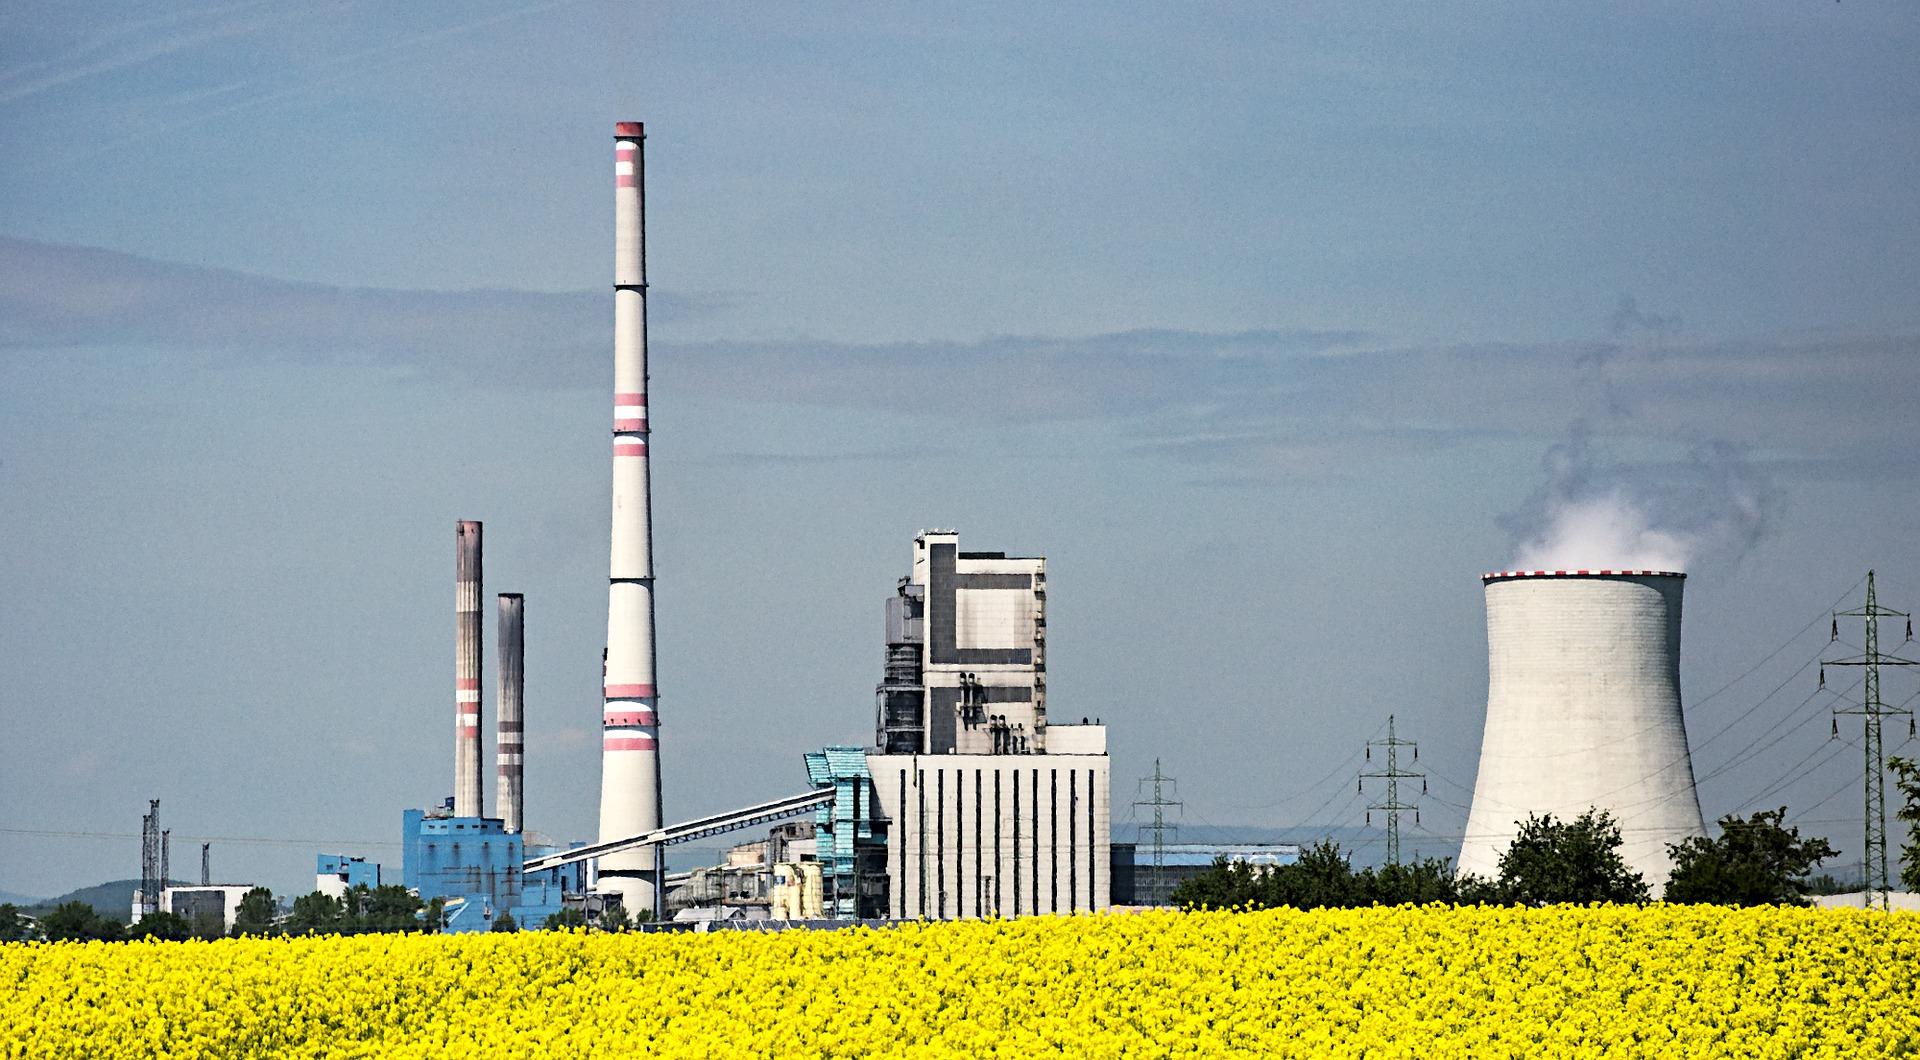 biofuel-2362512_1920.jpg